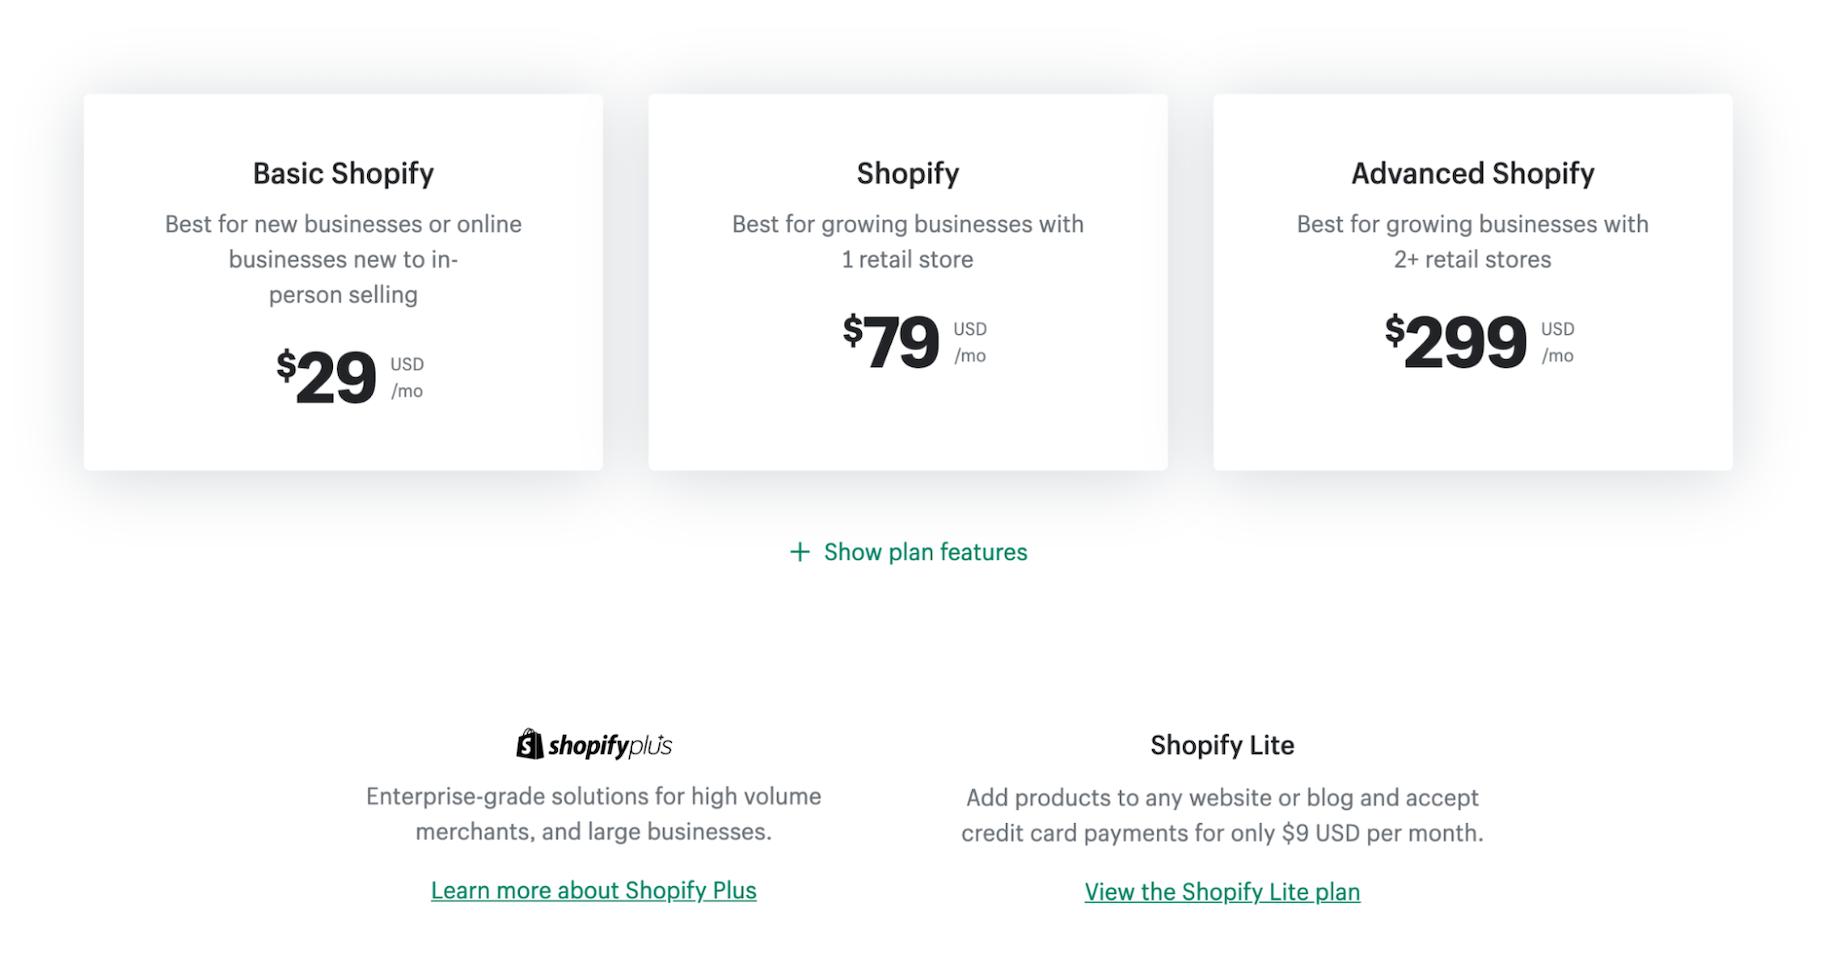 Squarespace vs. Shopify Pricing